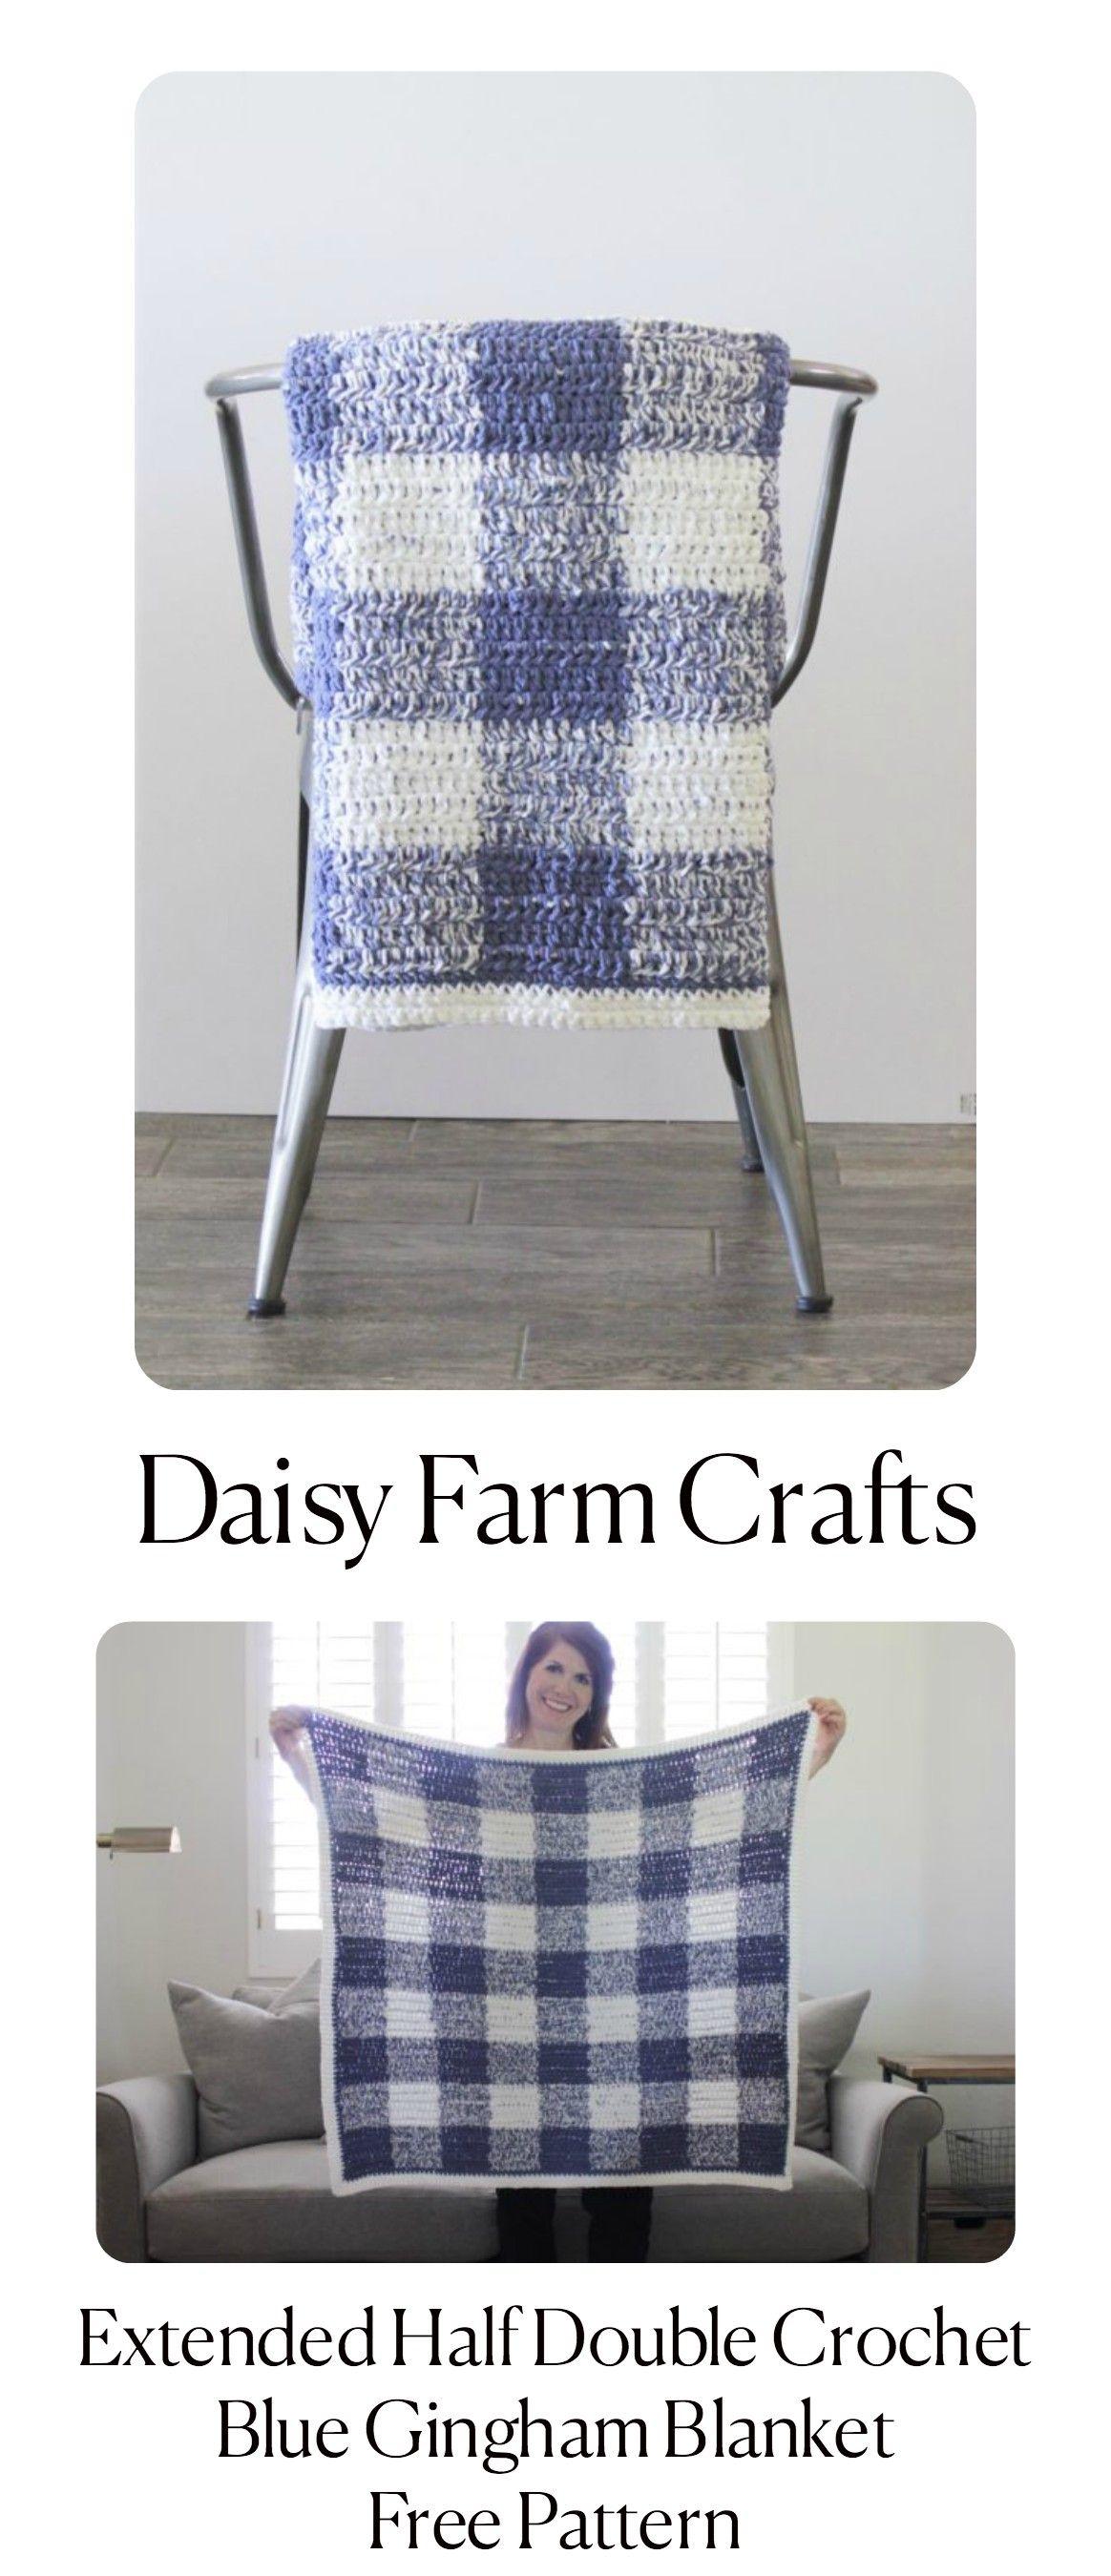 Extended Half Double Crochet Blue Gingham Blanket - Free Pattern ...